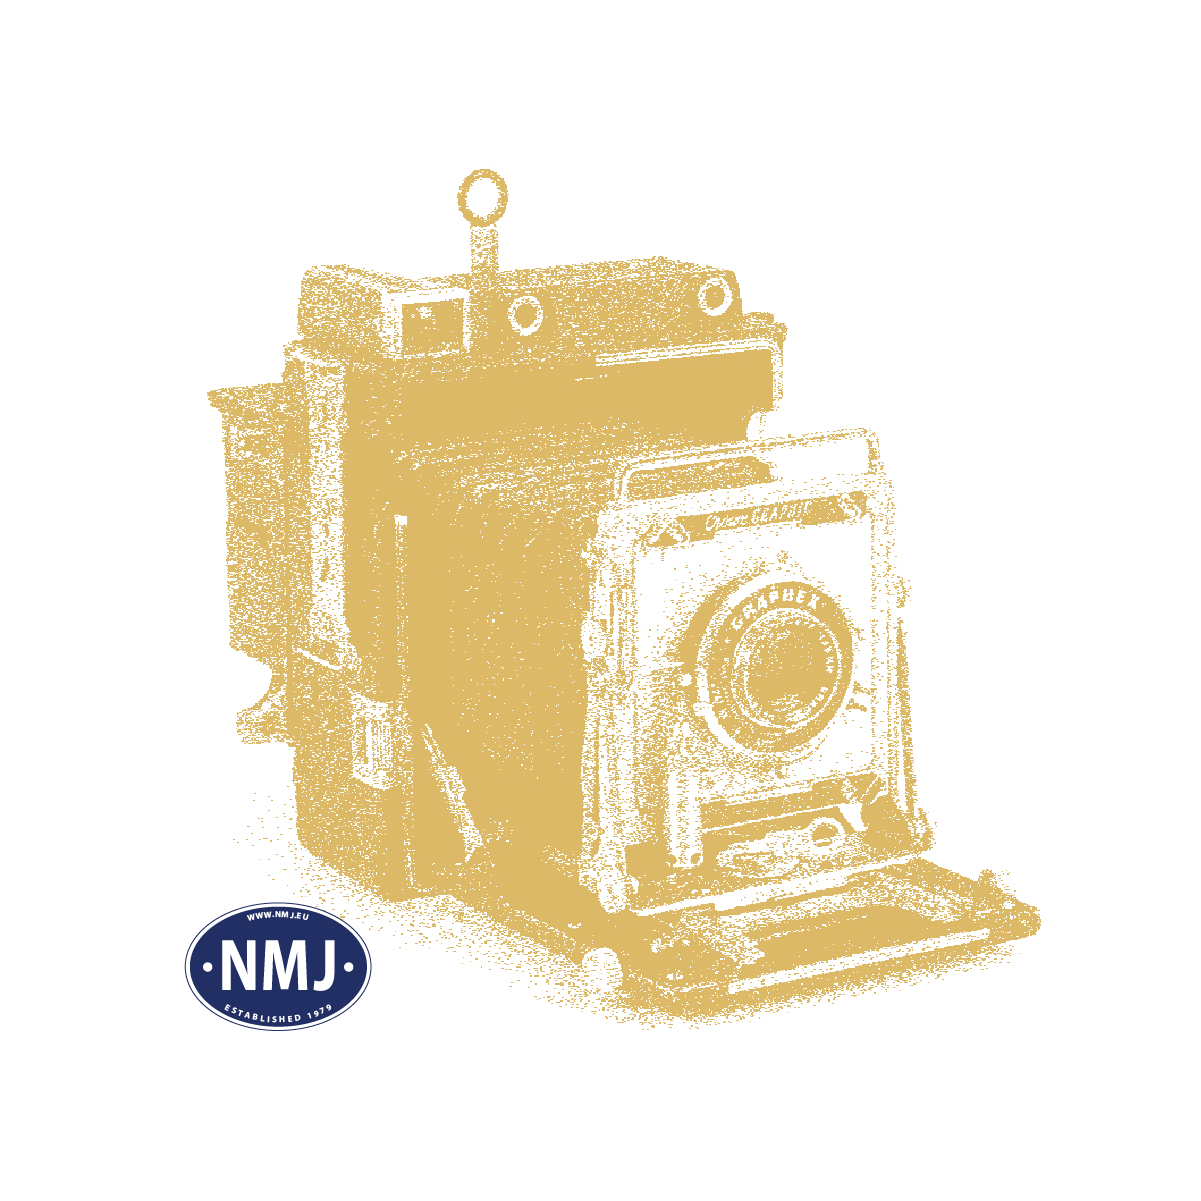 NMJT105.102 - NMJ Topline NSB A2 24007 Gammeldesign